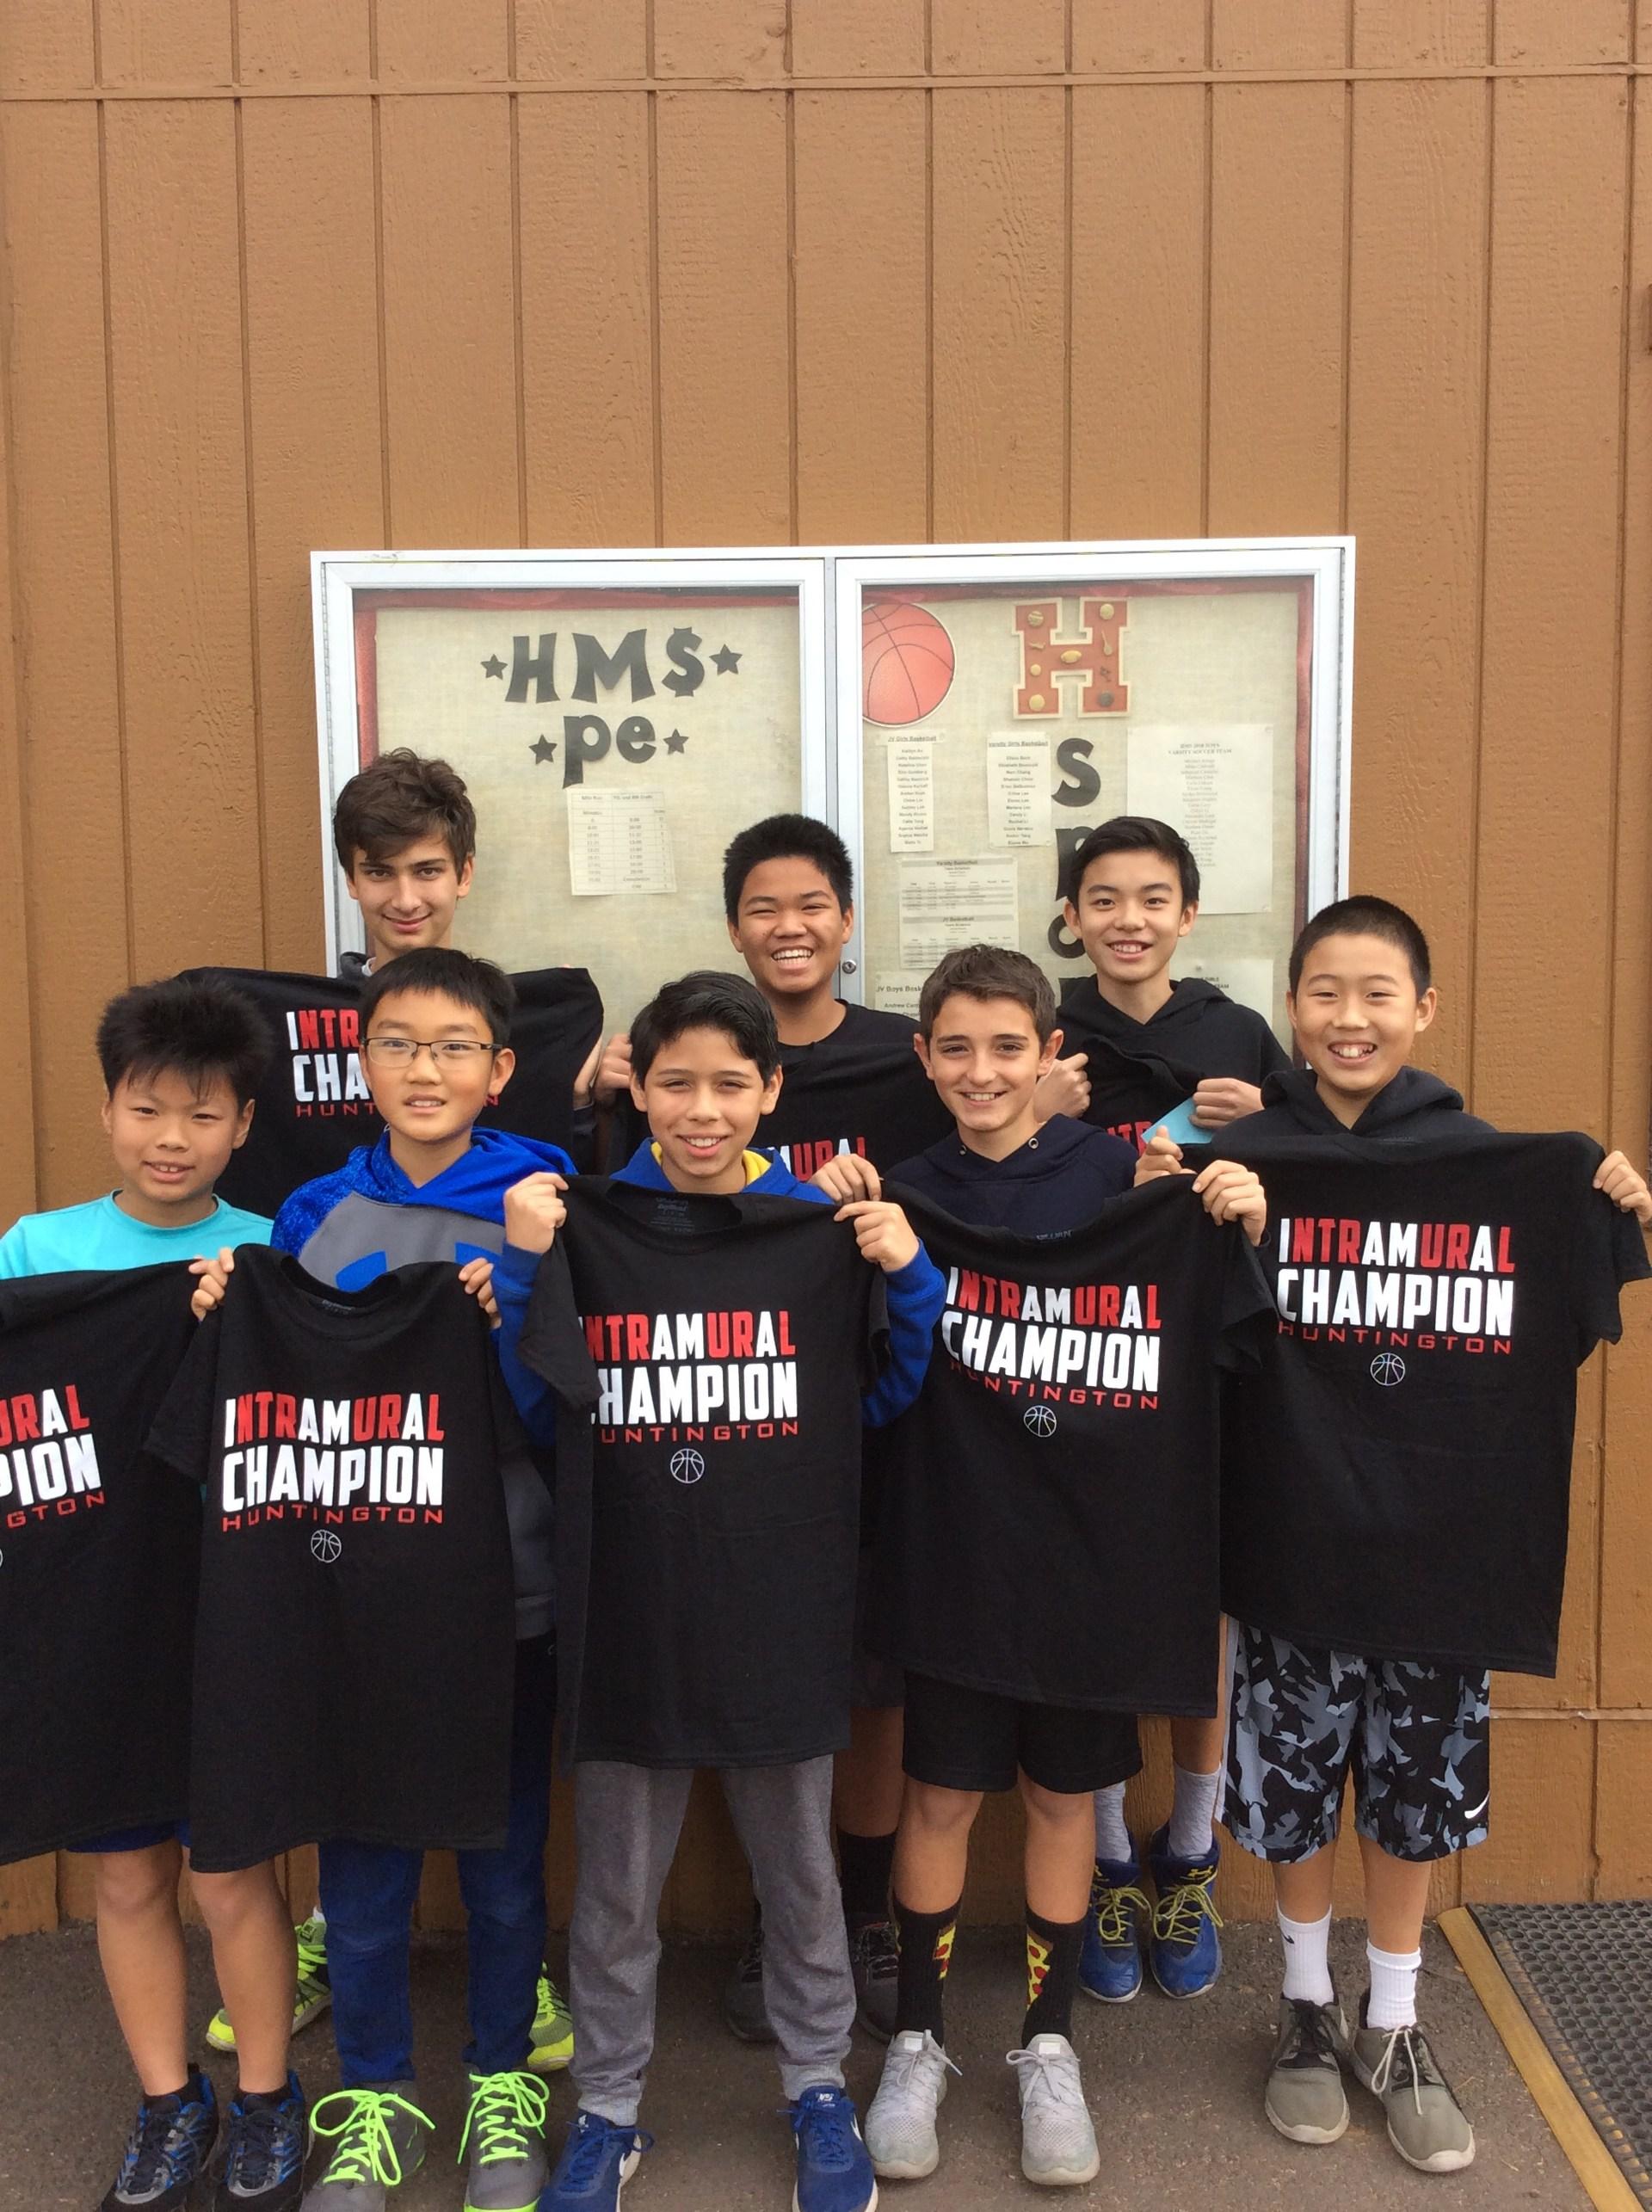 Boys Intramural Basketball Champions